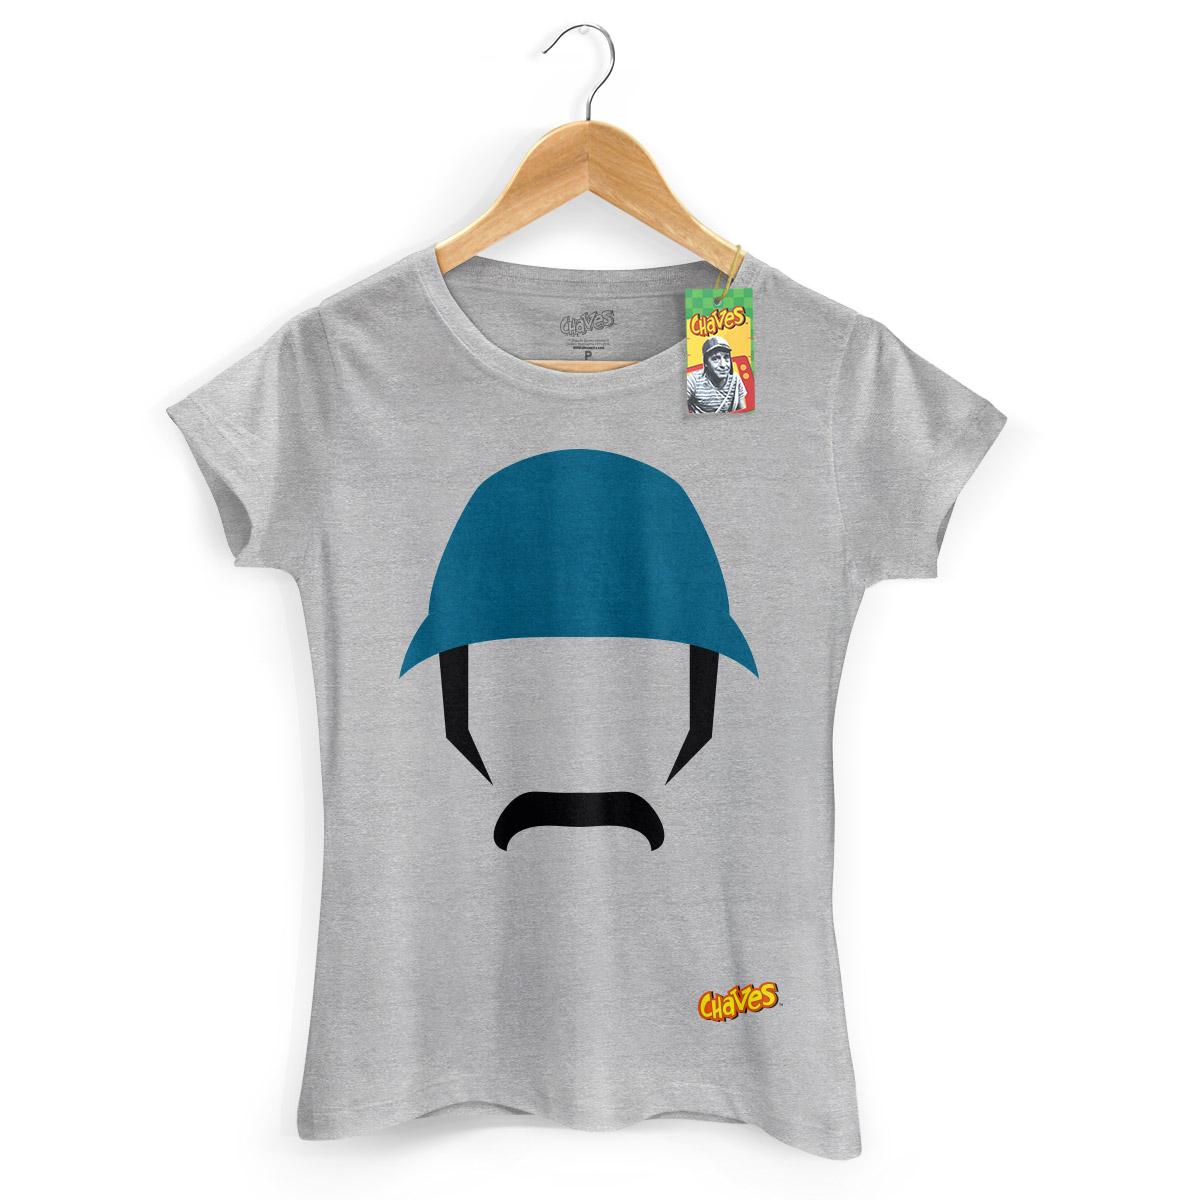 Camiseta Feminina Chaves Icone Seu Madruga